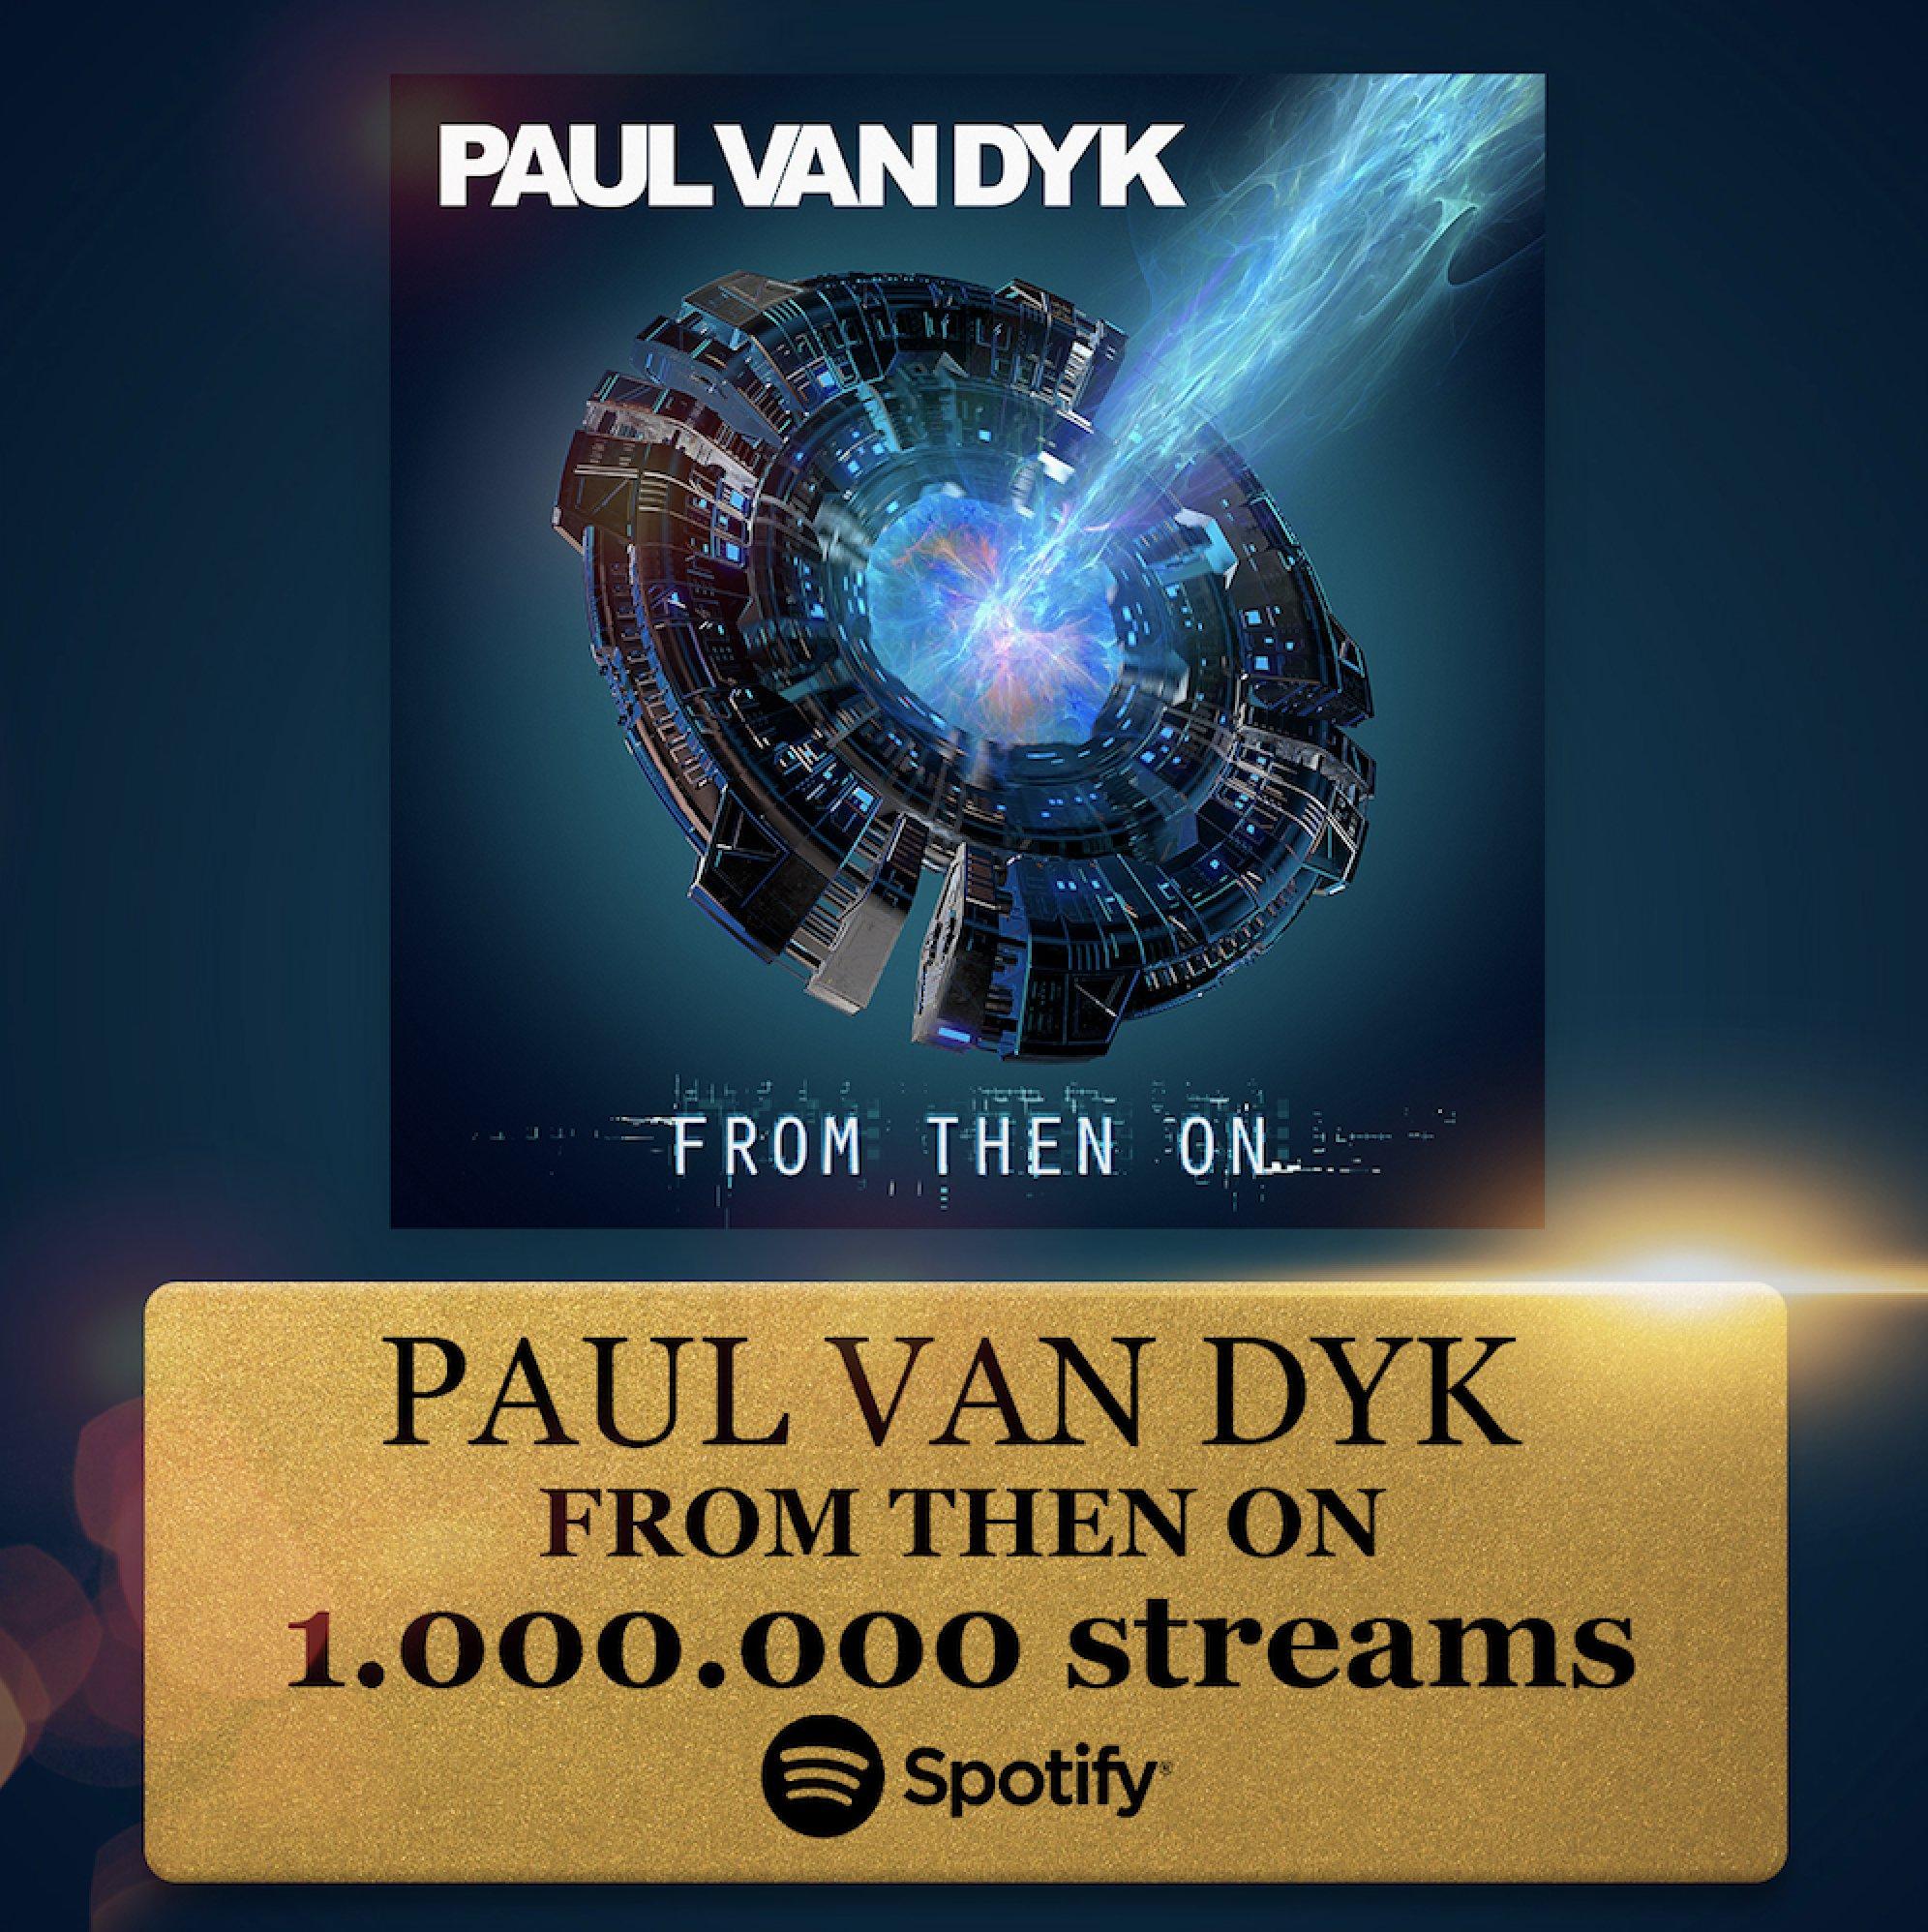 Over 1 Million #FromThenOn album streams.. ���� https://t.co/mUONEExtaj https://t.co/rbCsOLYG4D